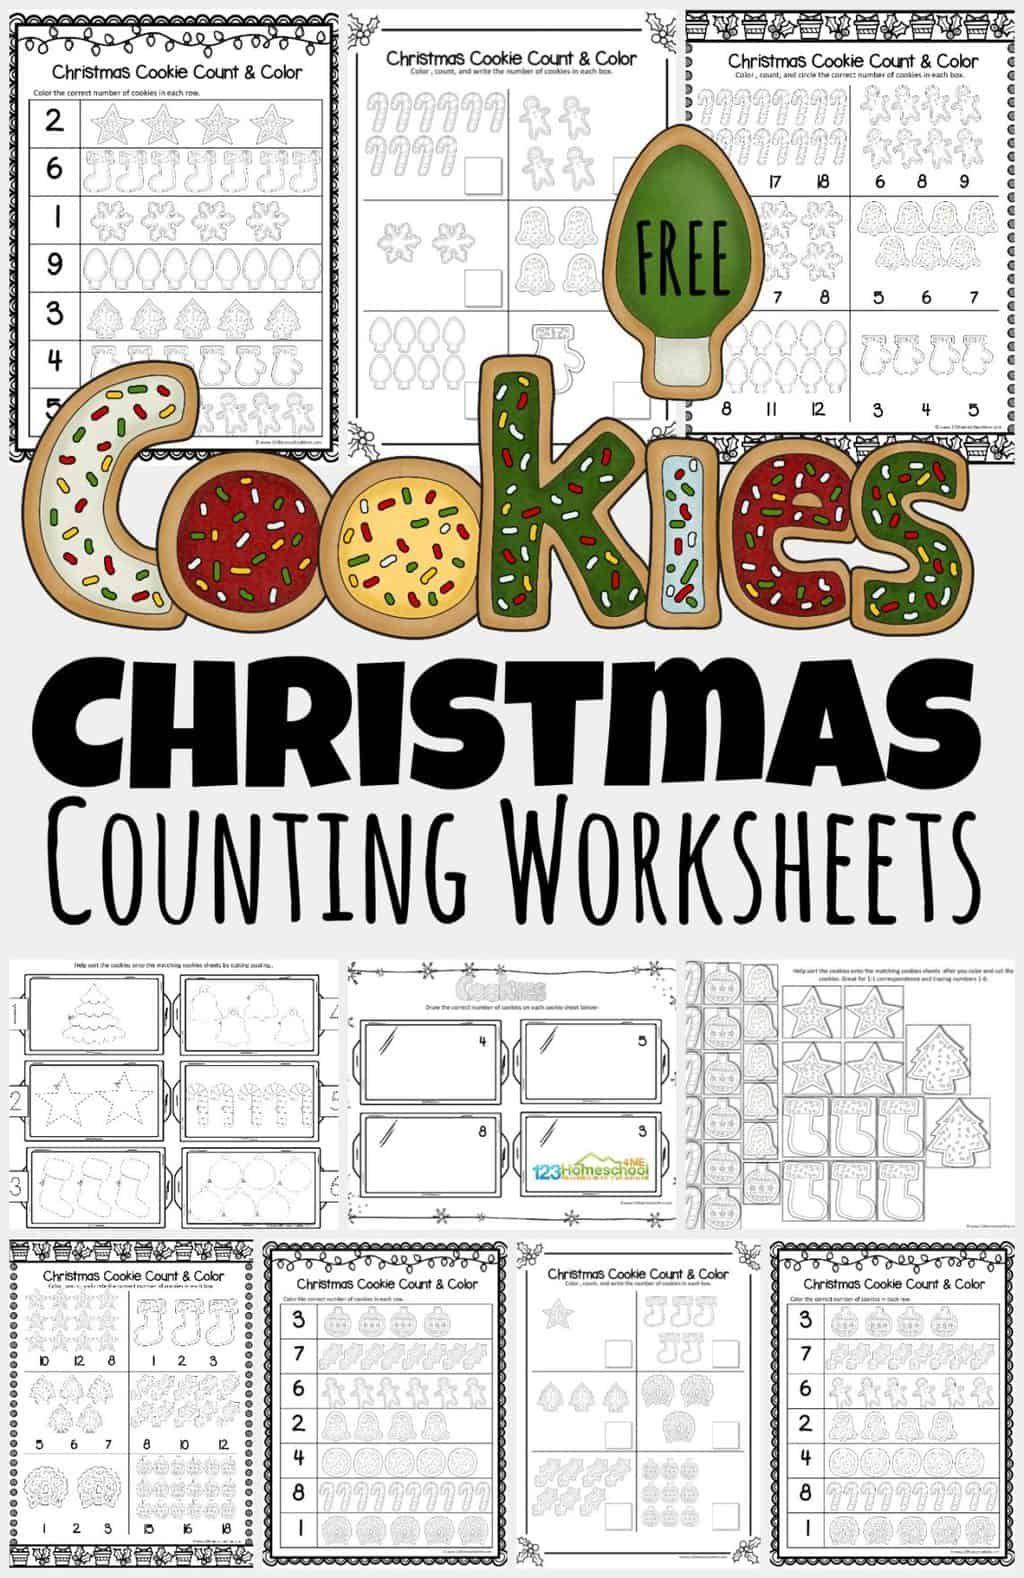 Free Christmas Cookies Counting Worksheets Preschool Worksheets Free Printables Counting Worksheets For Kindergarten Christmas Math Worksheets [ 1578 x 1024 Pixel ]